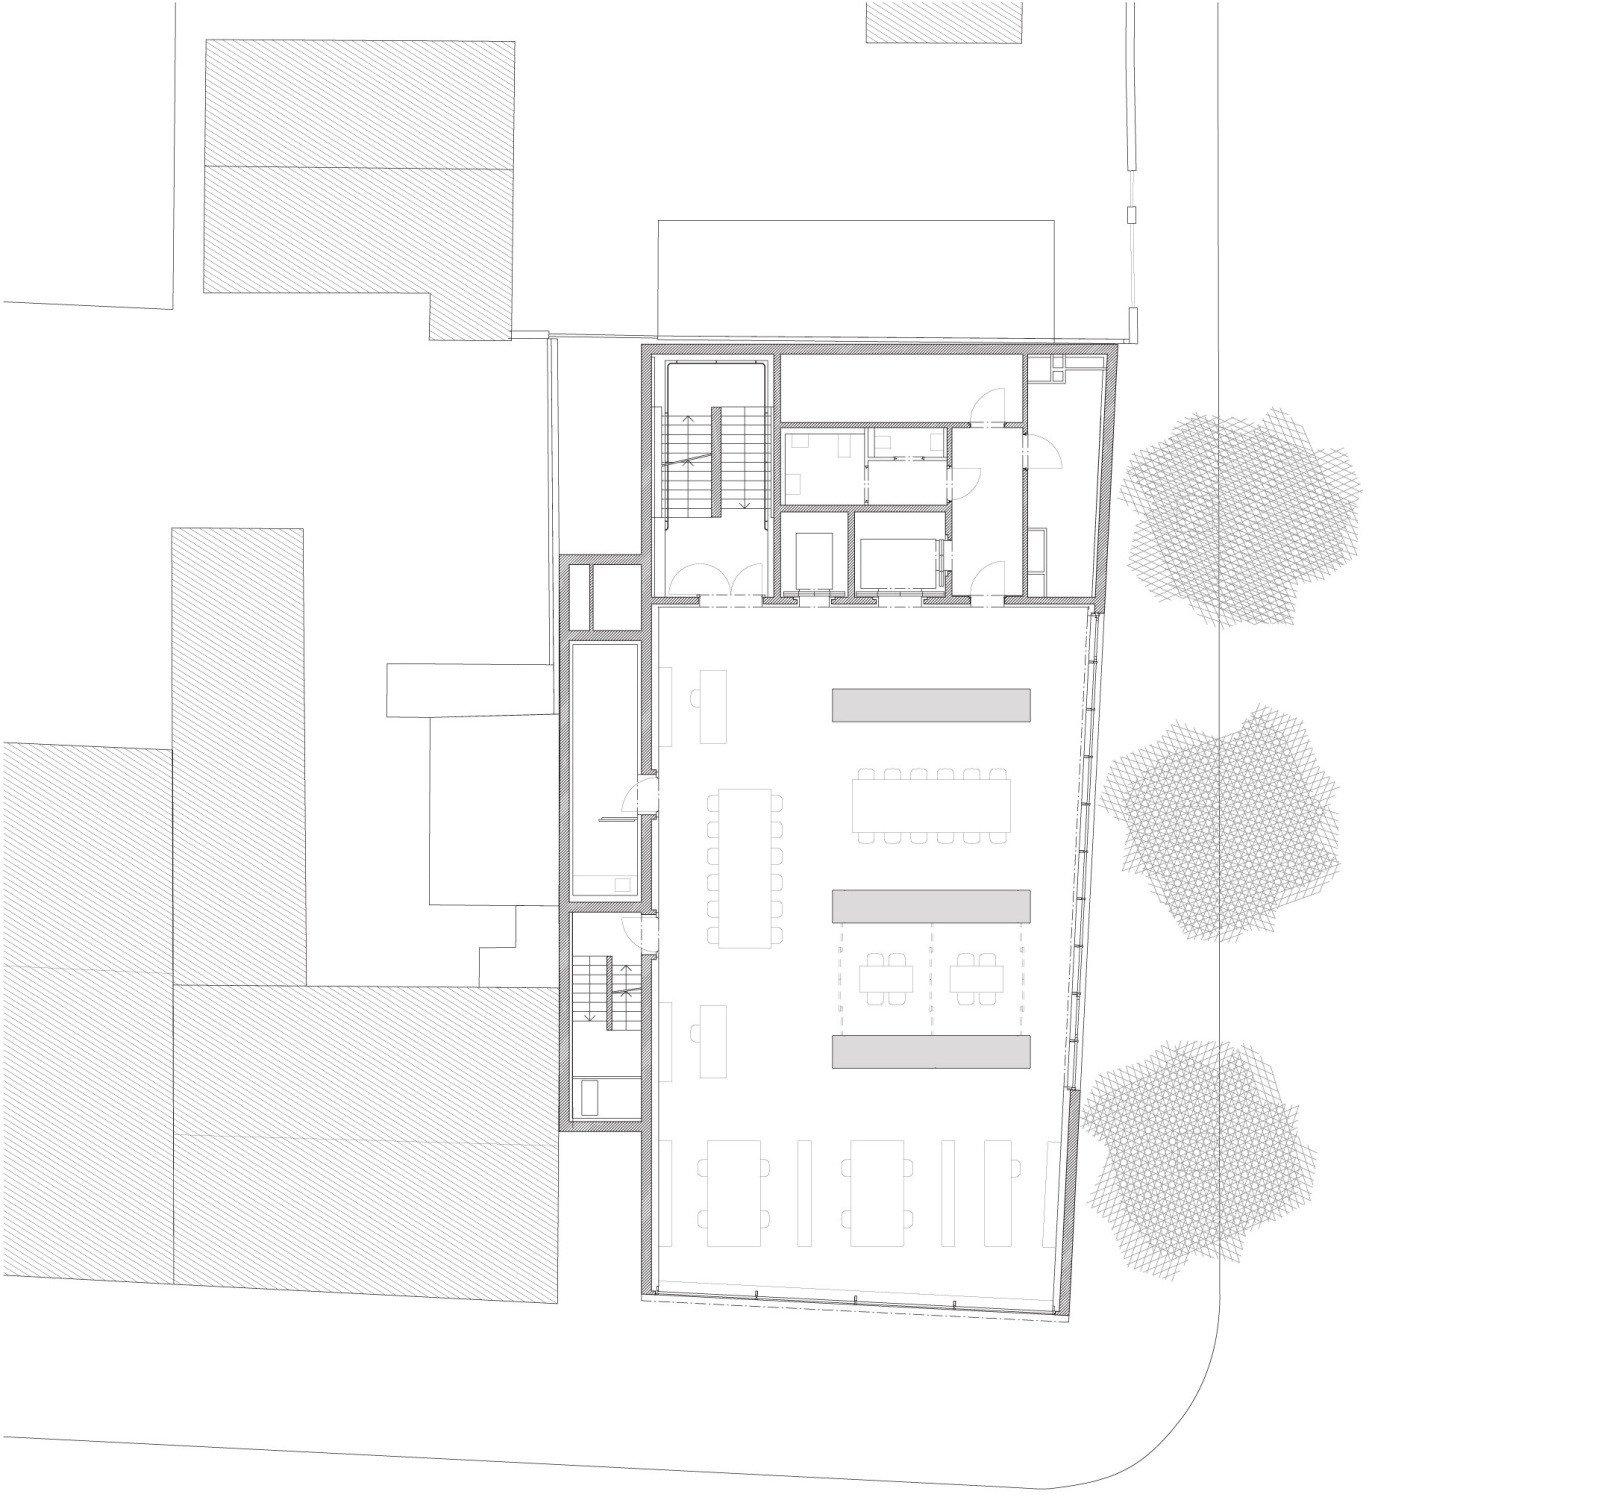 shoah memorial in drancy beton kultur baunetz wissen. Black Bedroom Furniture Sets. Home Design Ideas